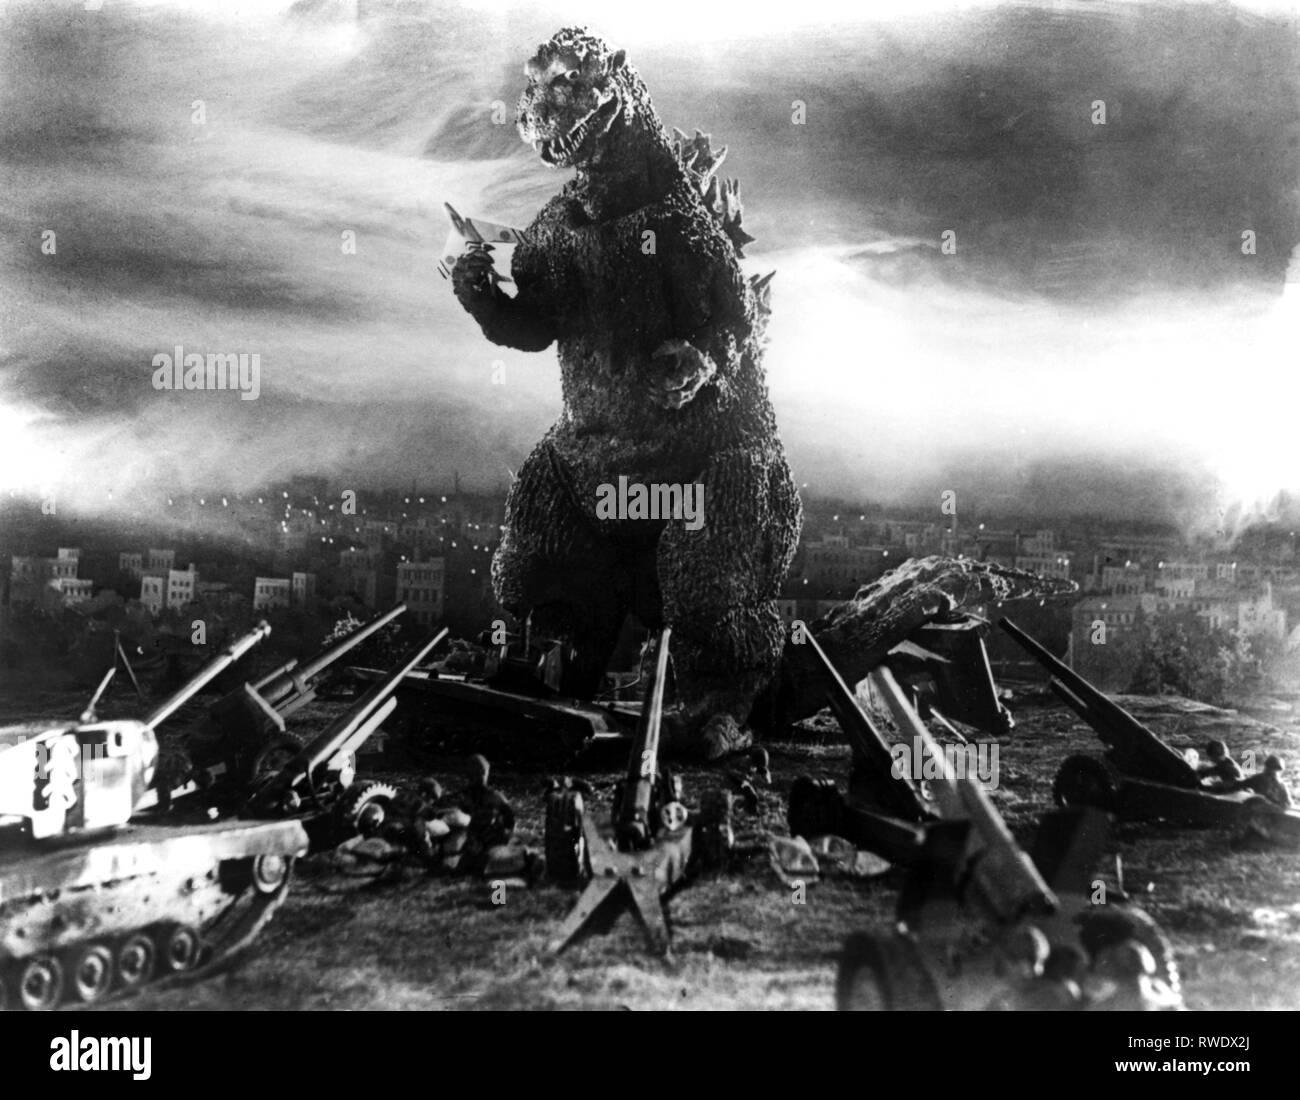 ARMY ATTACKS MONSTER, GODZILLA, 1954 - Stock Image